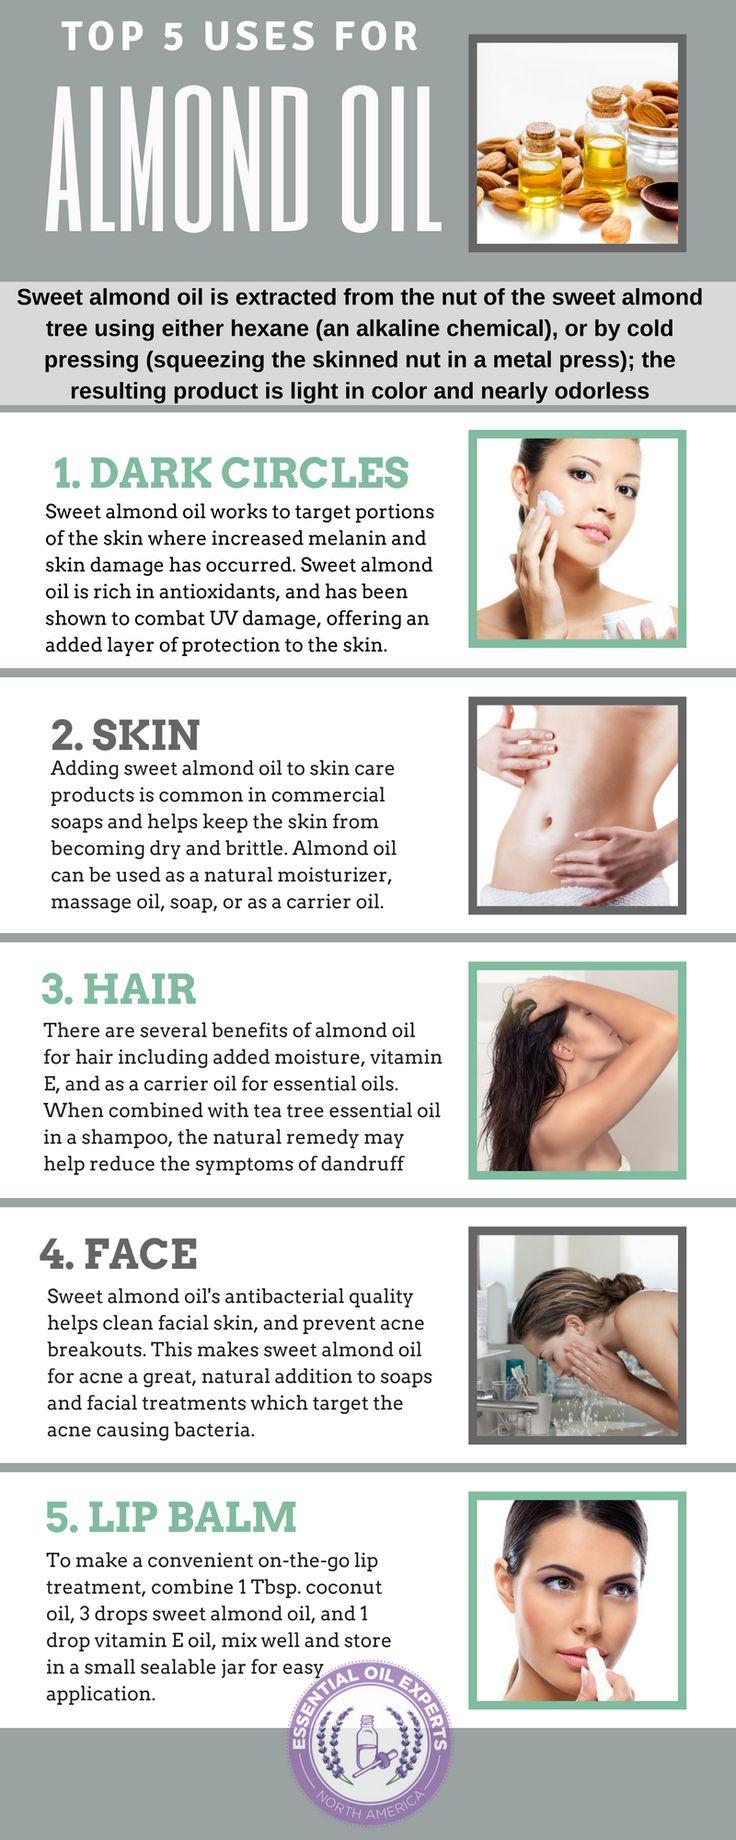 Sweet Almond Oil: For Dark Circles, Skin, Hair, Face & Where to Buy